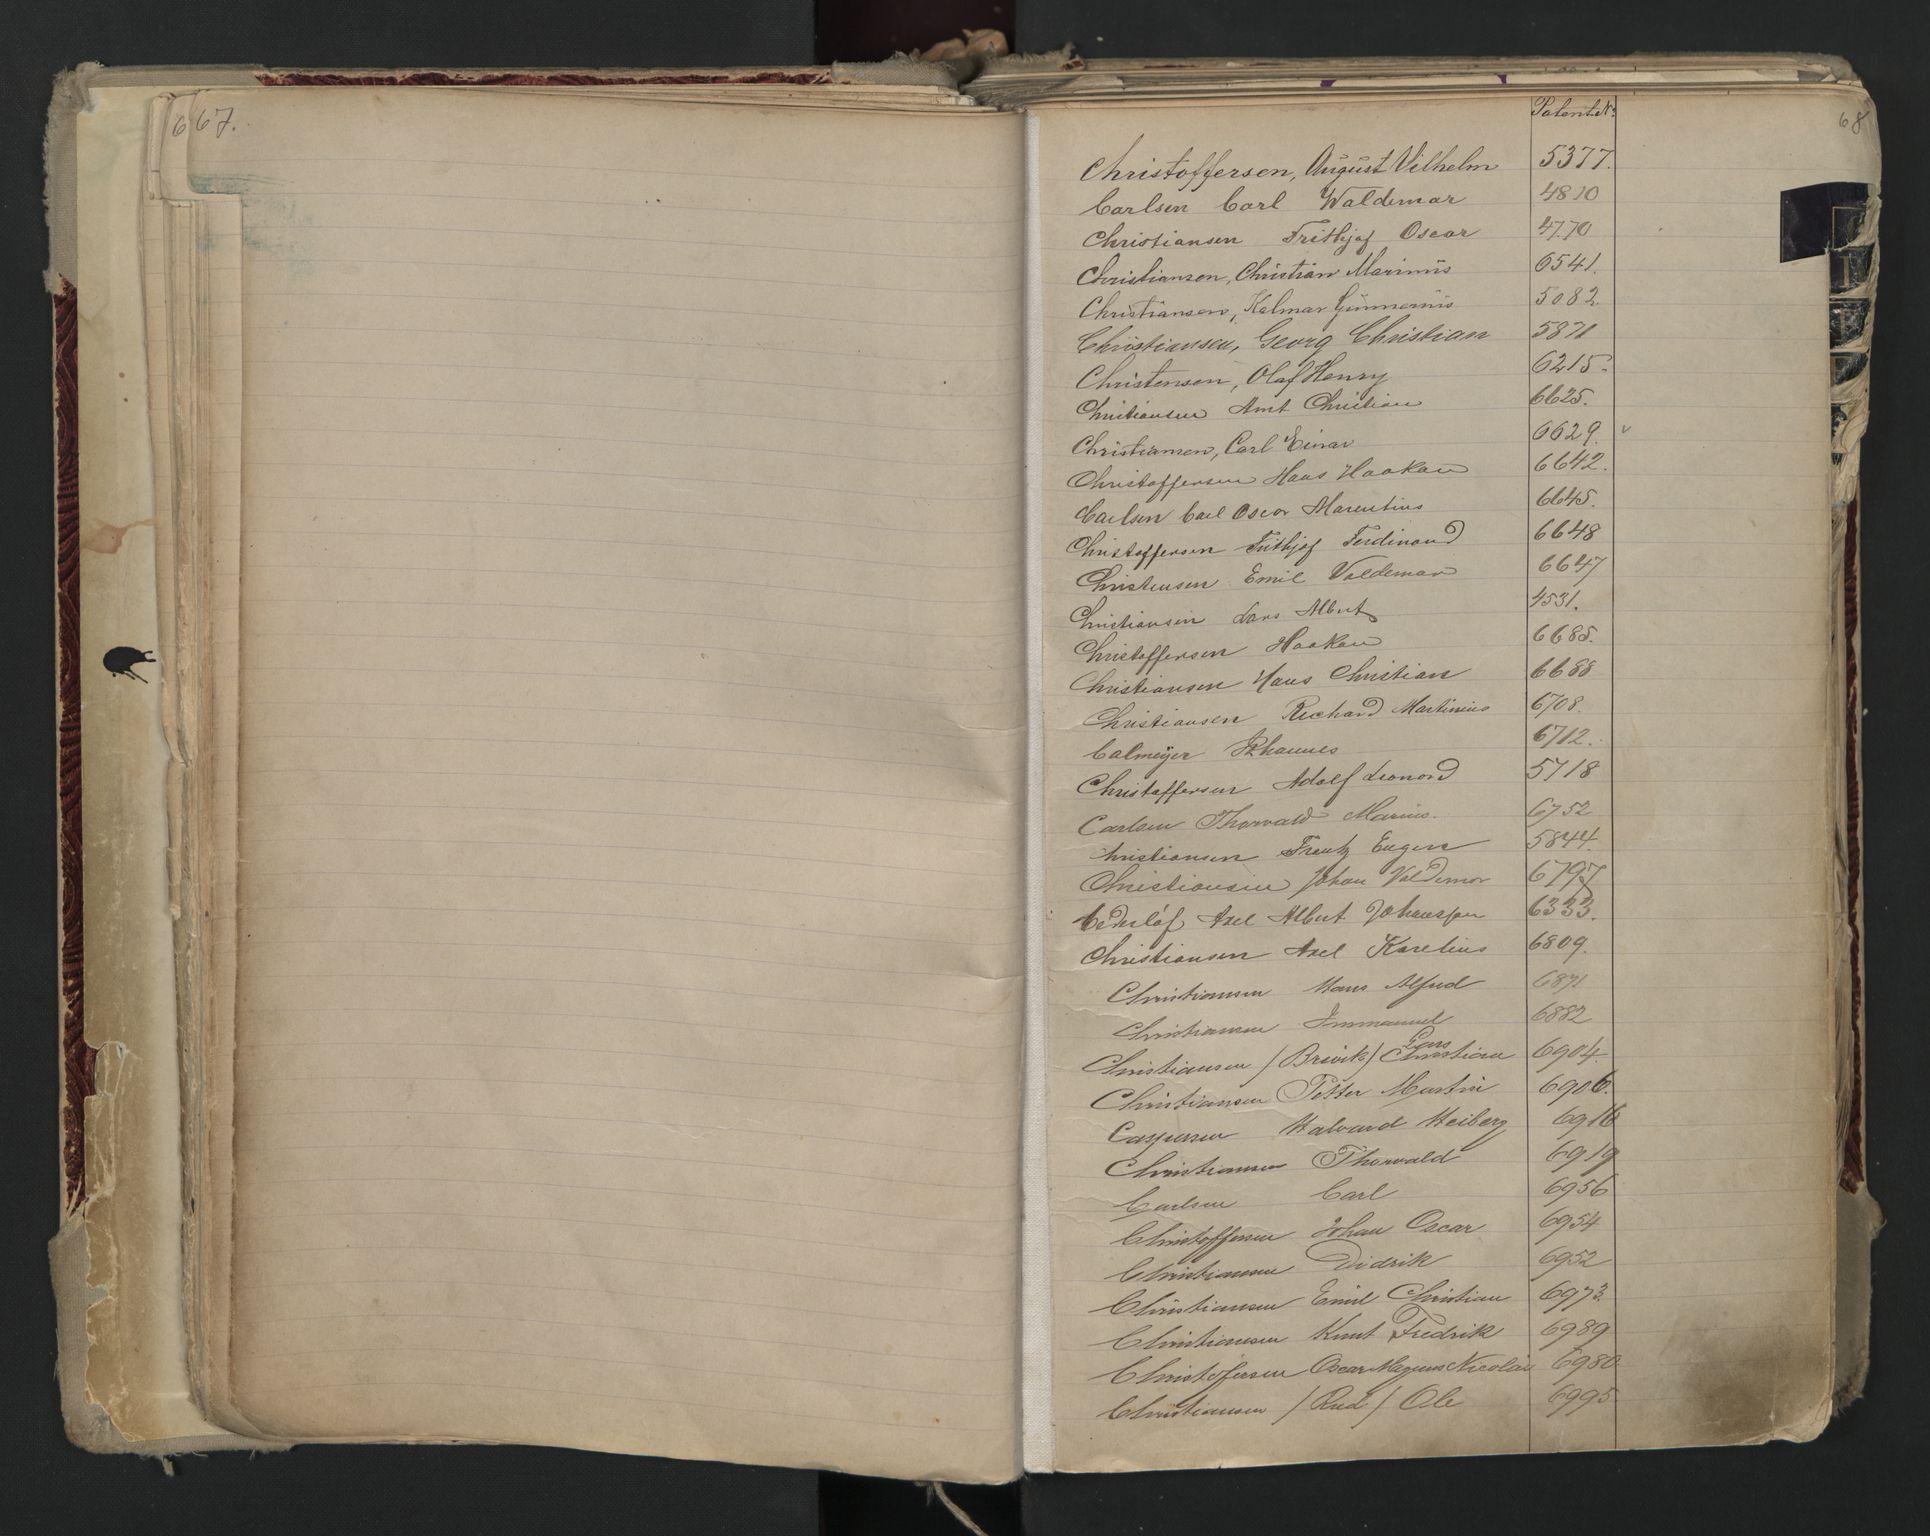 SAO, Oslo sjømannskontor, F/Fa/L0002: Register for Kristiania krets, 1866-1930, s. 67-68